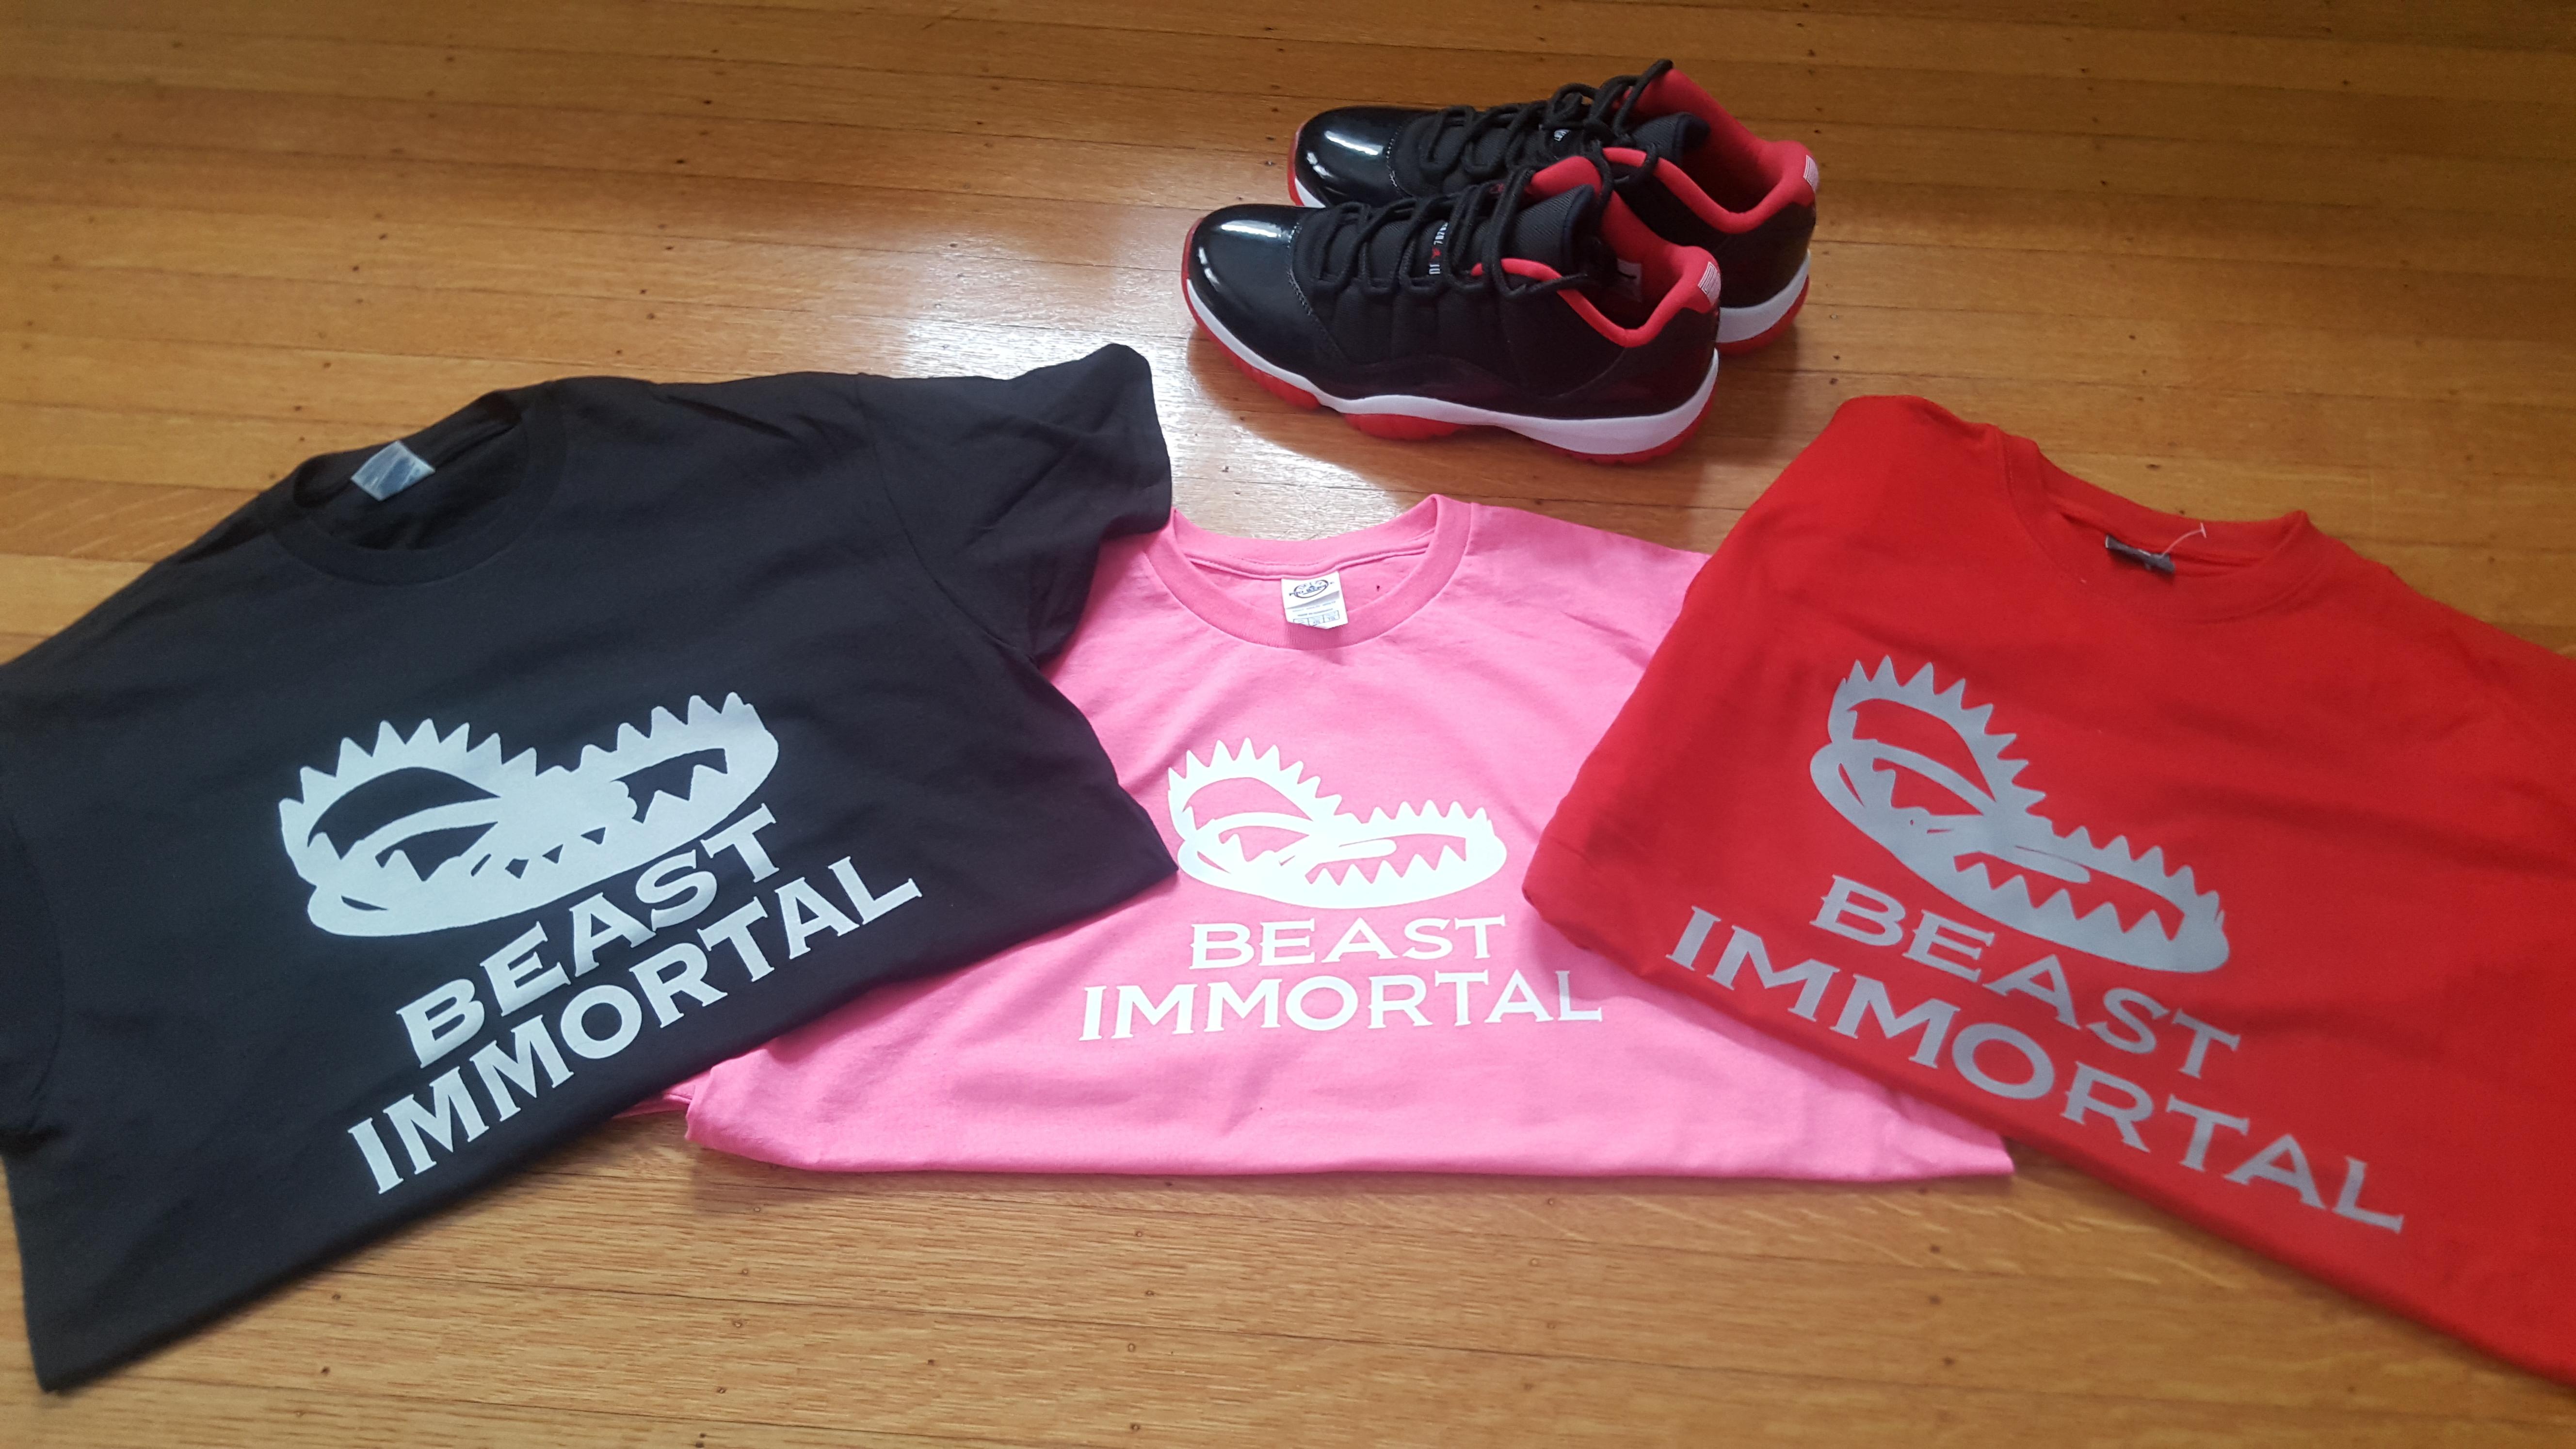 Beast Immortal pink t-shirt 0022